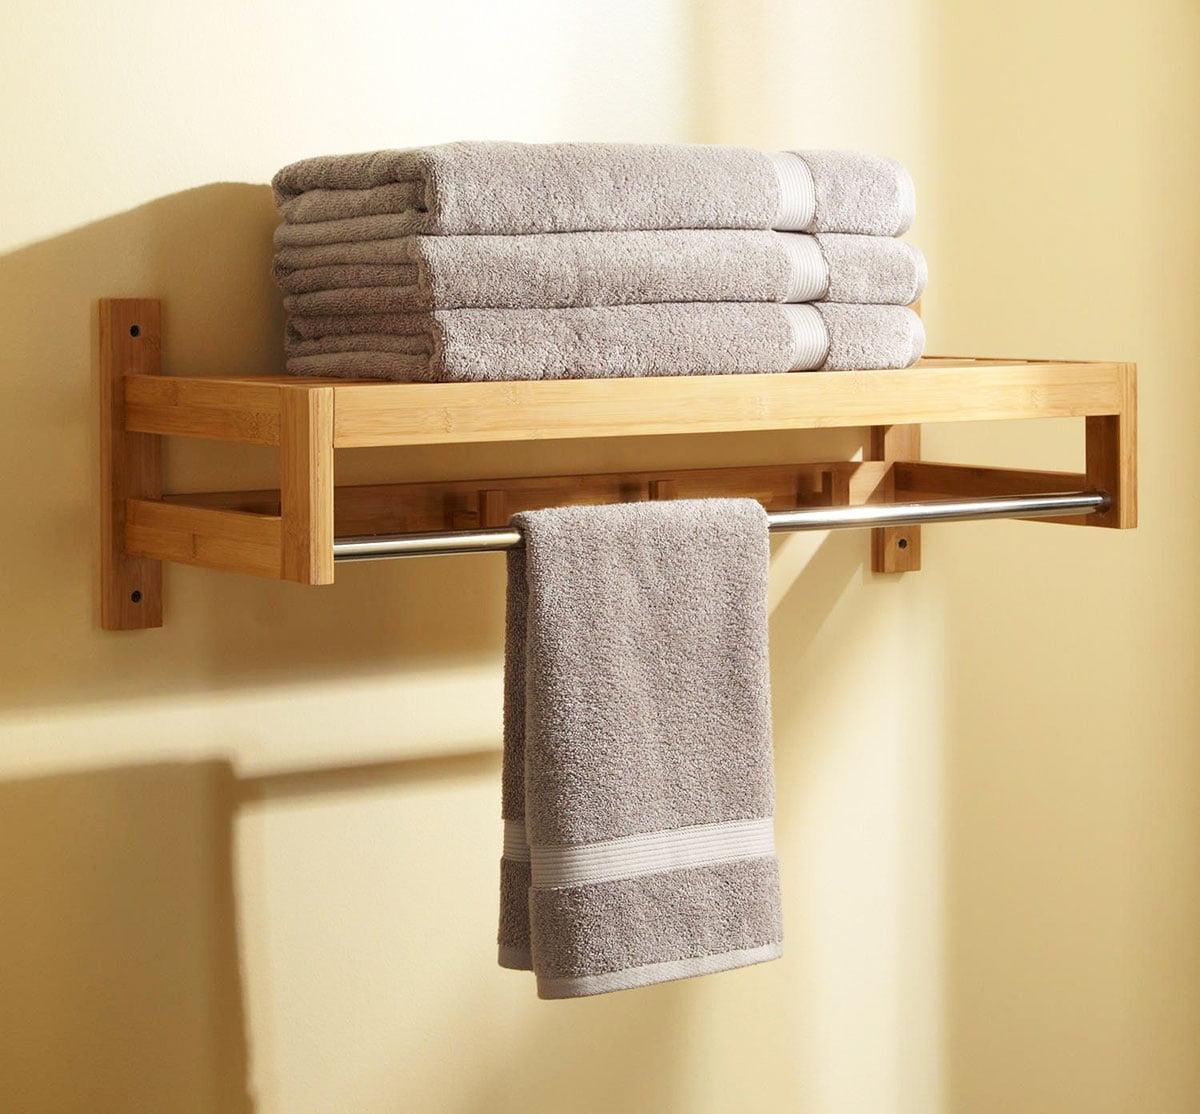 Towel racks - small house decorating ideas